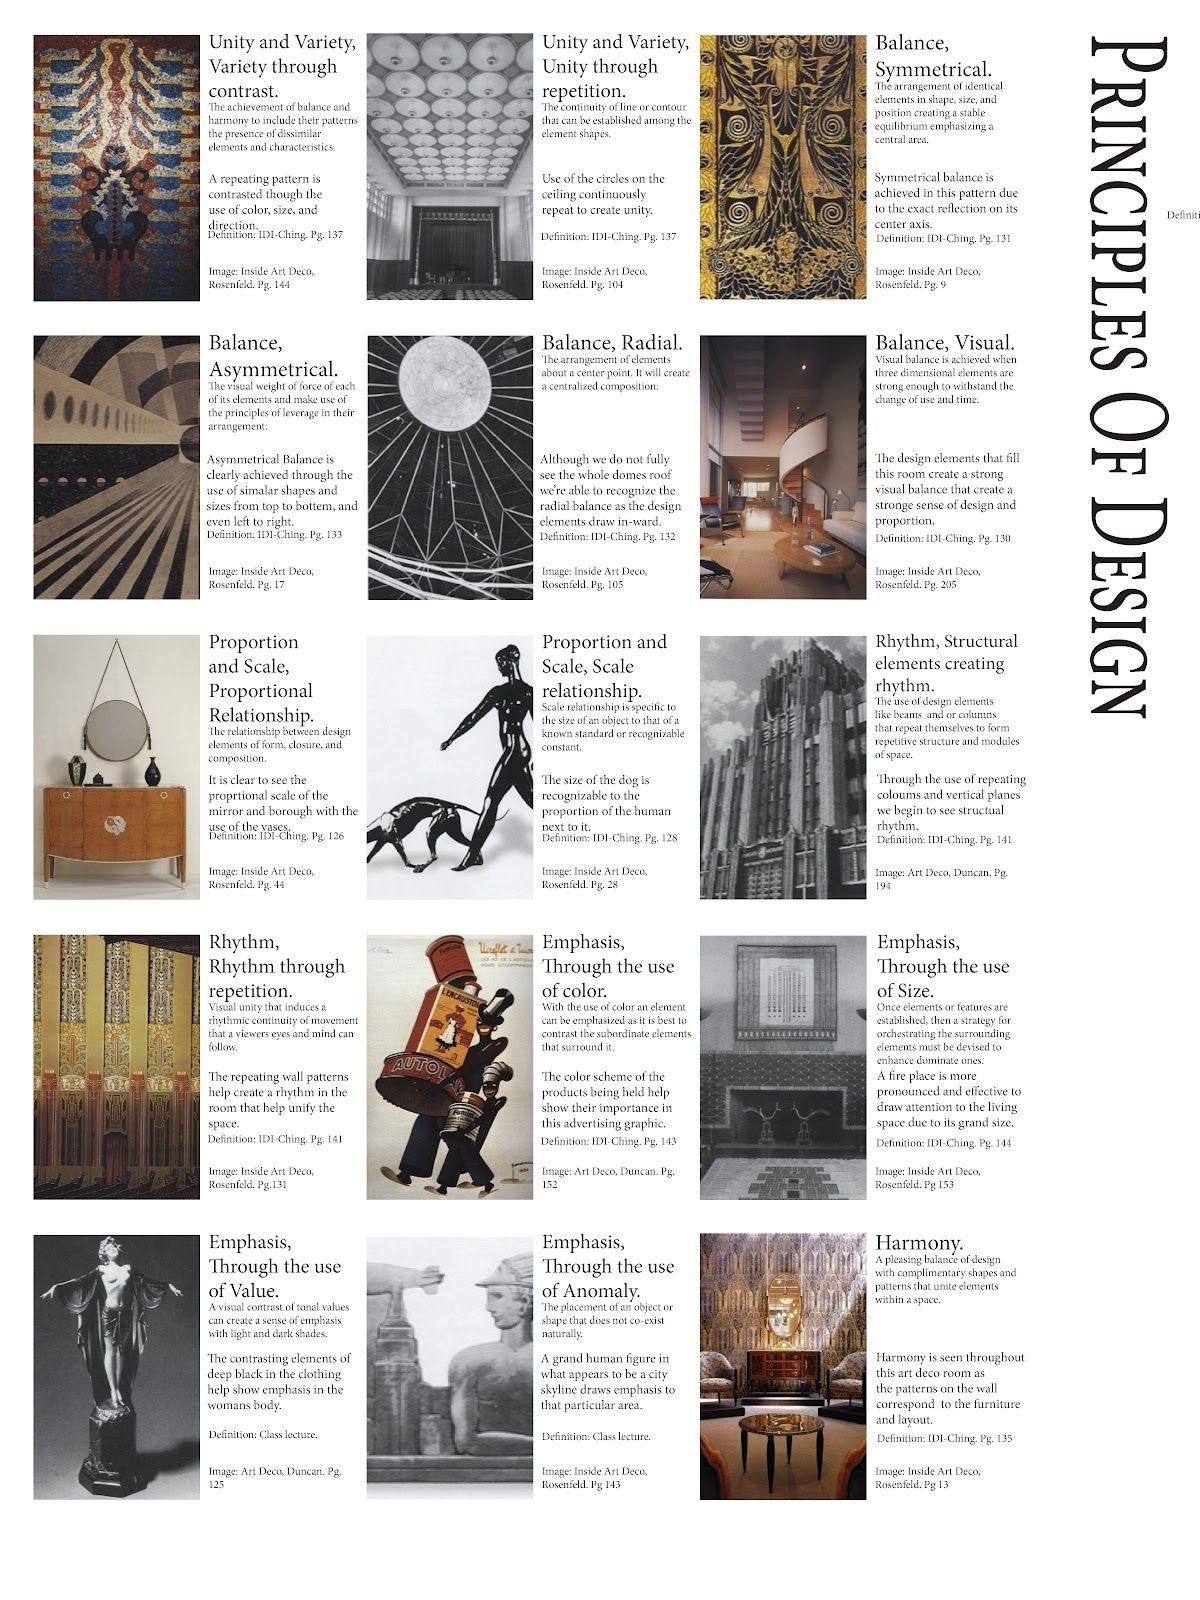 Elements And Principles Of Design Principles Of Design Elements